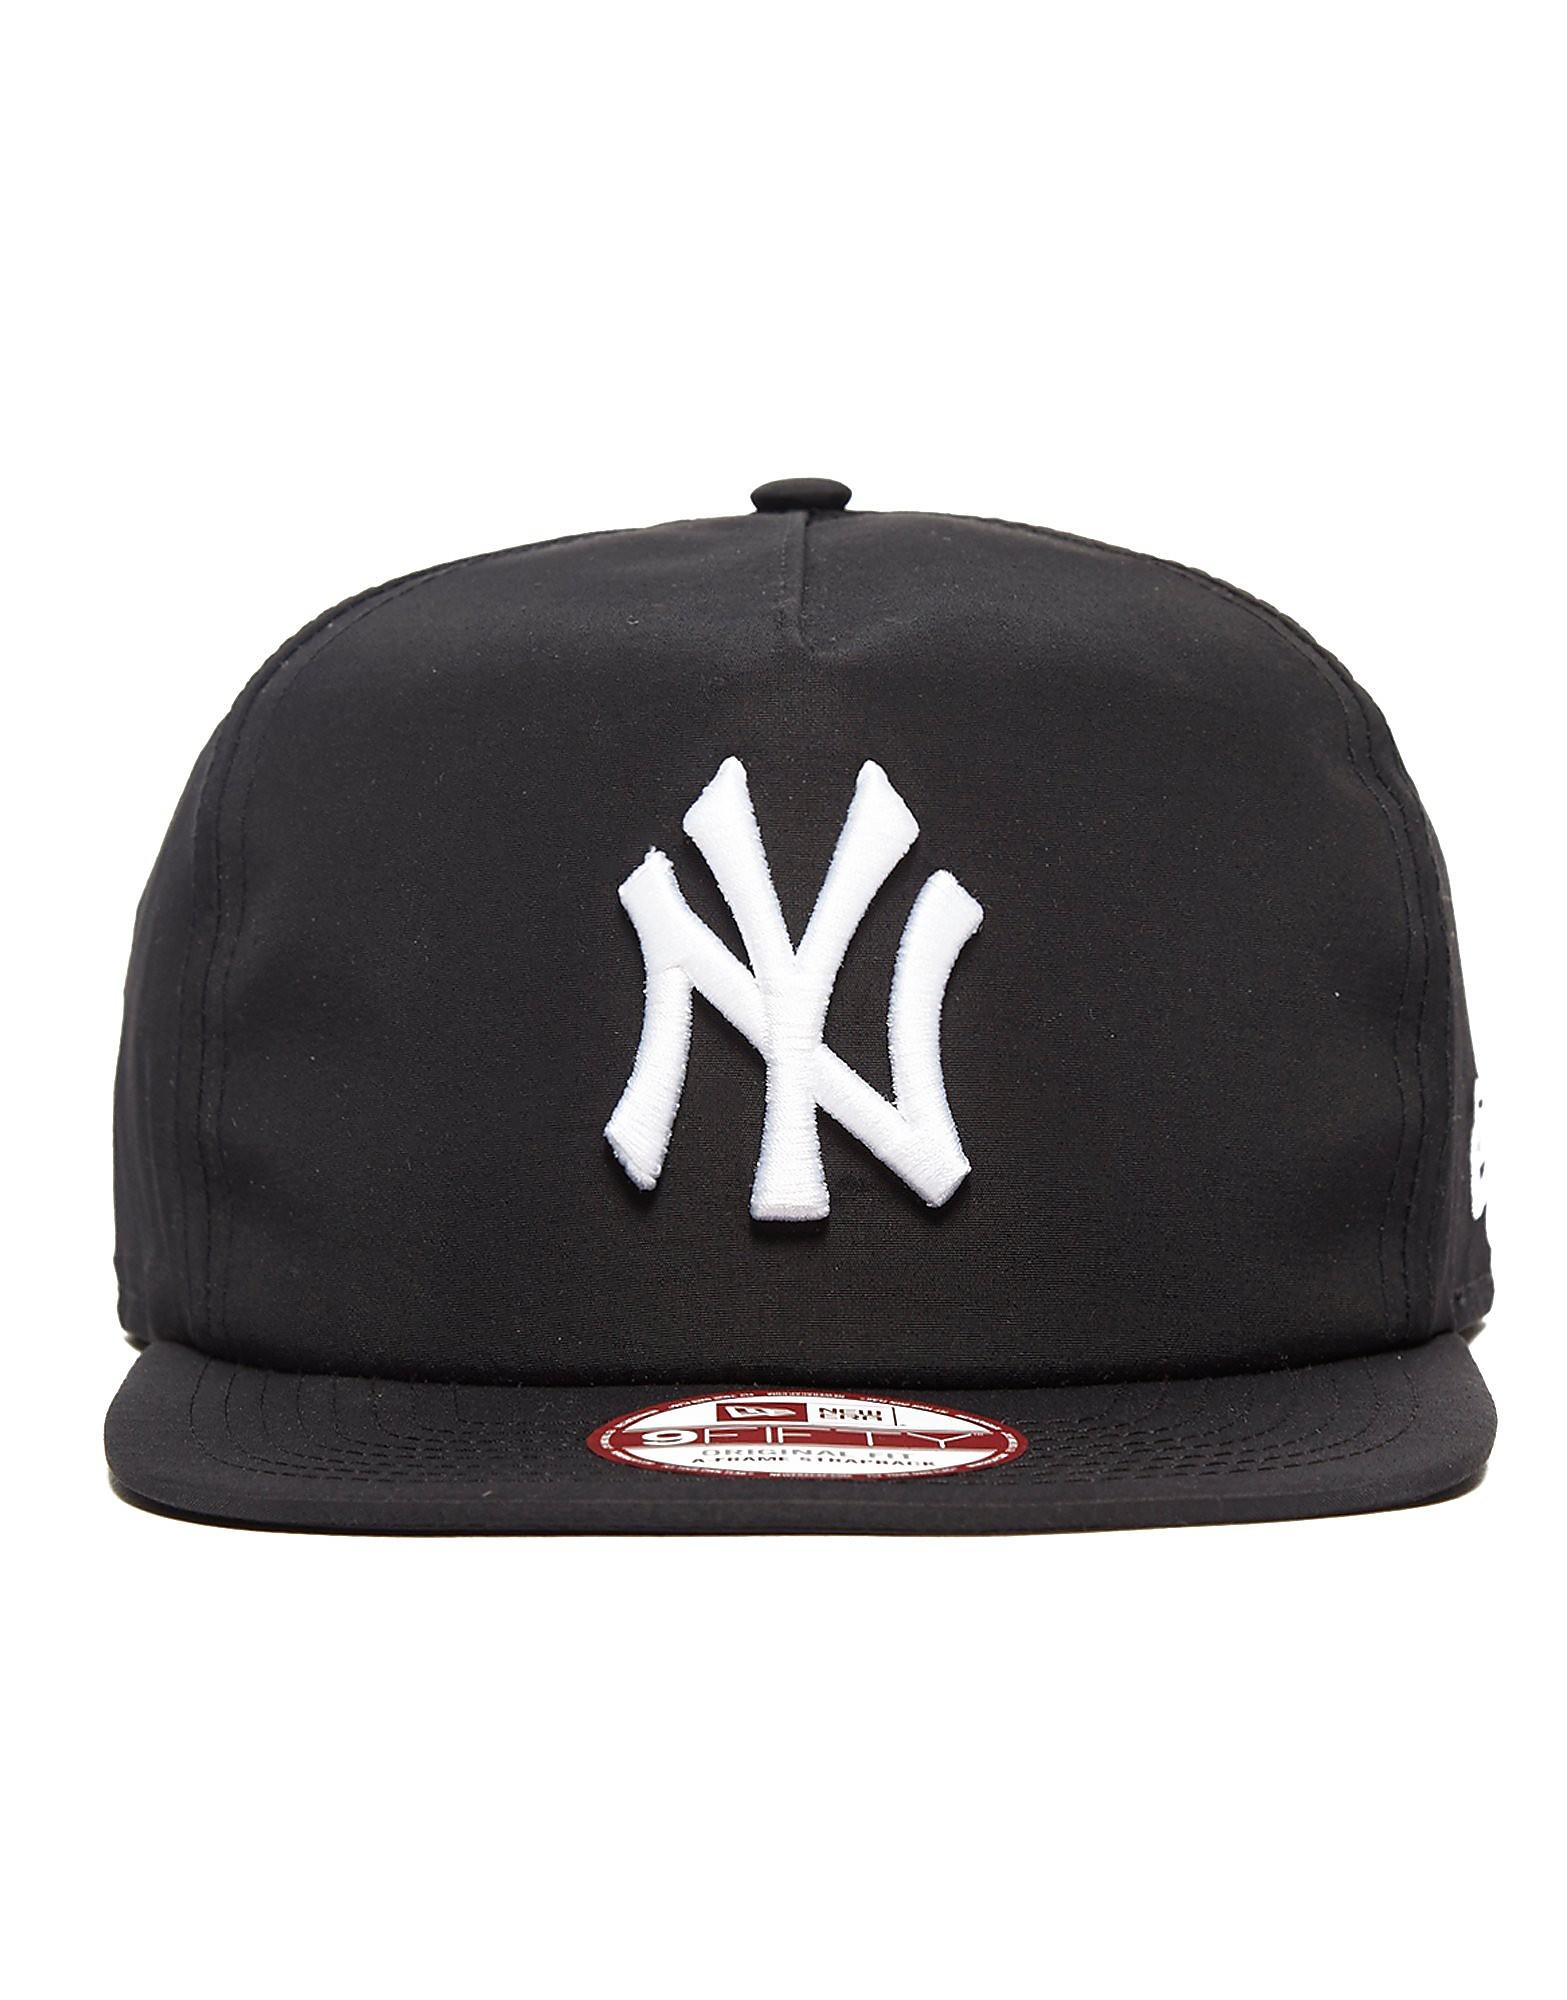 New Era MLB New York Yankees 9FIFTY Remix Snapback Cap